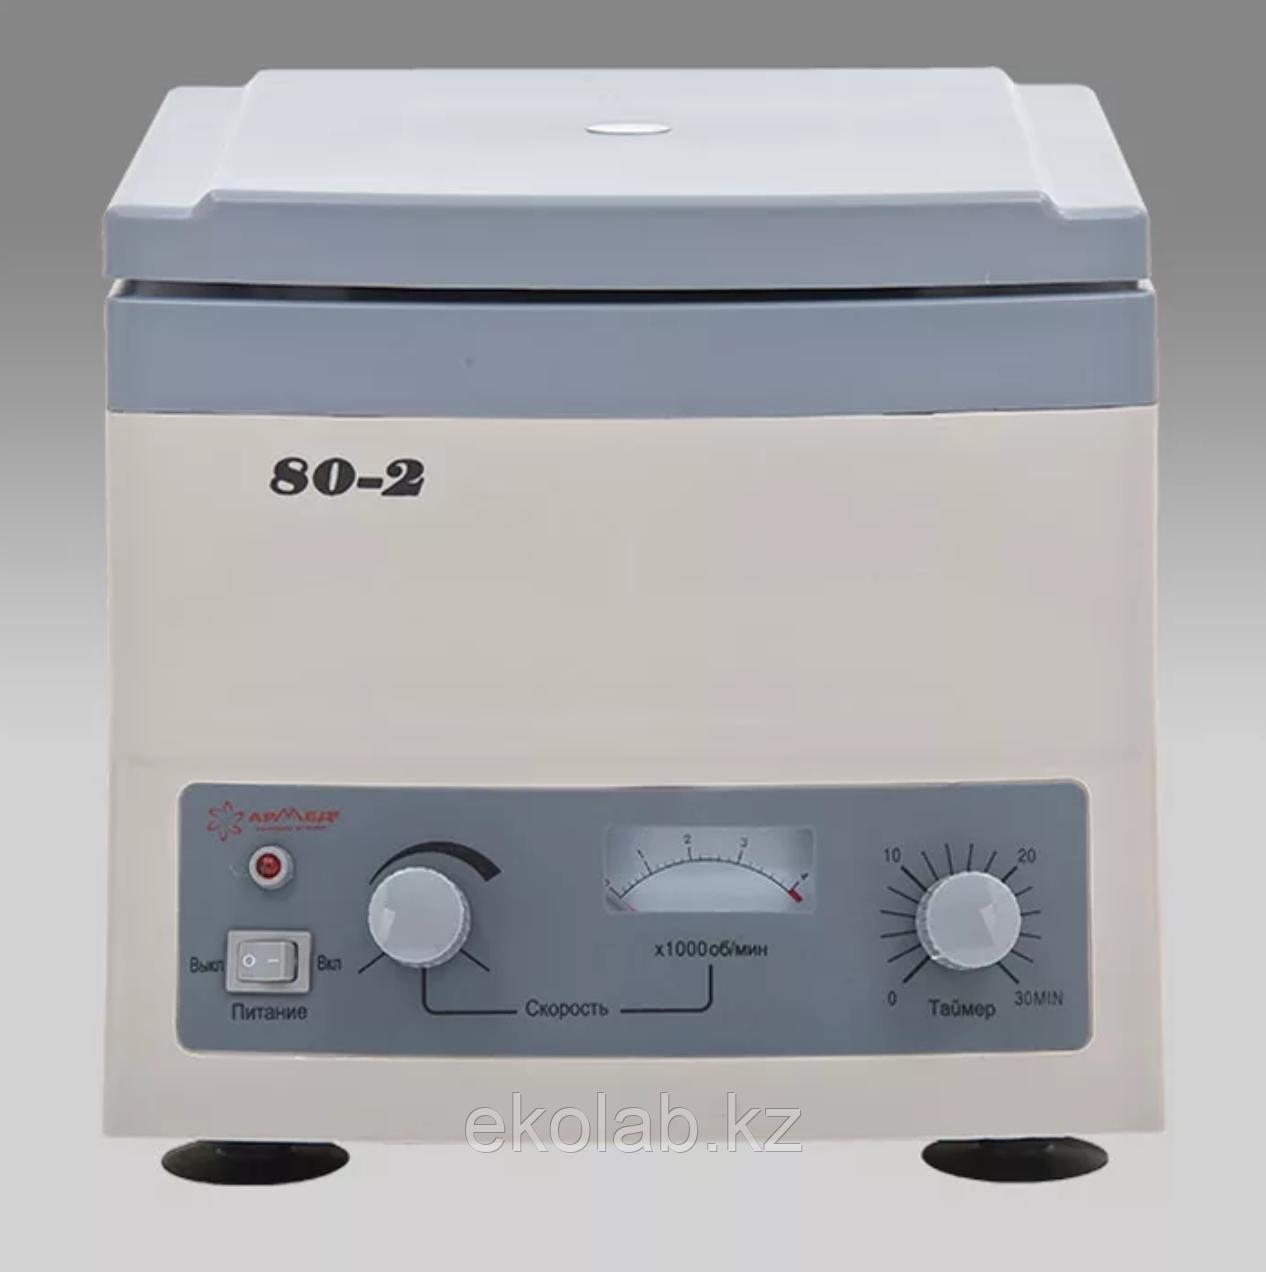 Центрифуга Armed 80-2 (аналоговая, 1-4 тыс. об/мин, шаг 500 об)